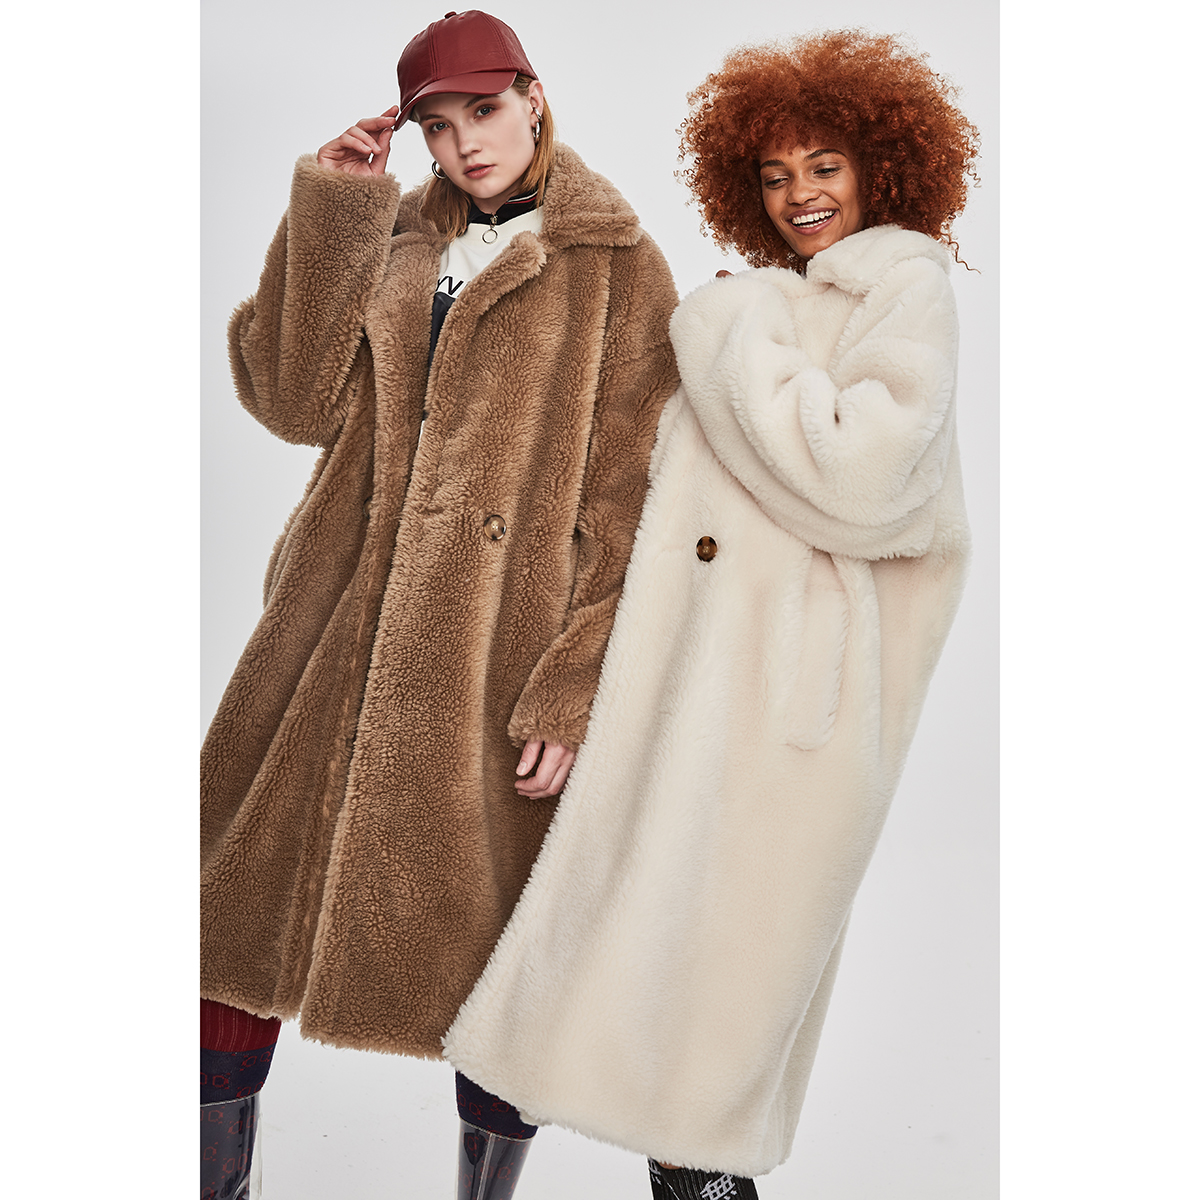 jazzevar winter new fashion teddy bear icon coat x long. Black Bedroom Furniture Sets. Home Design Ideas